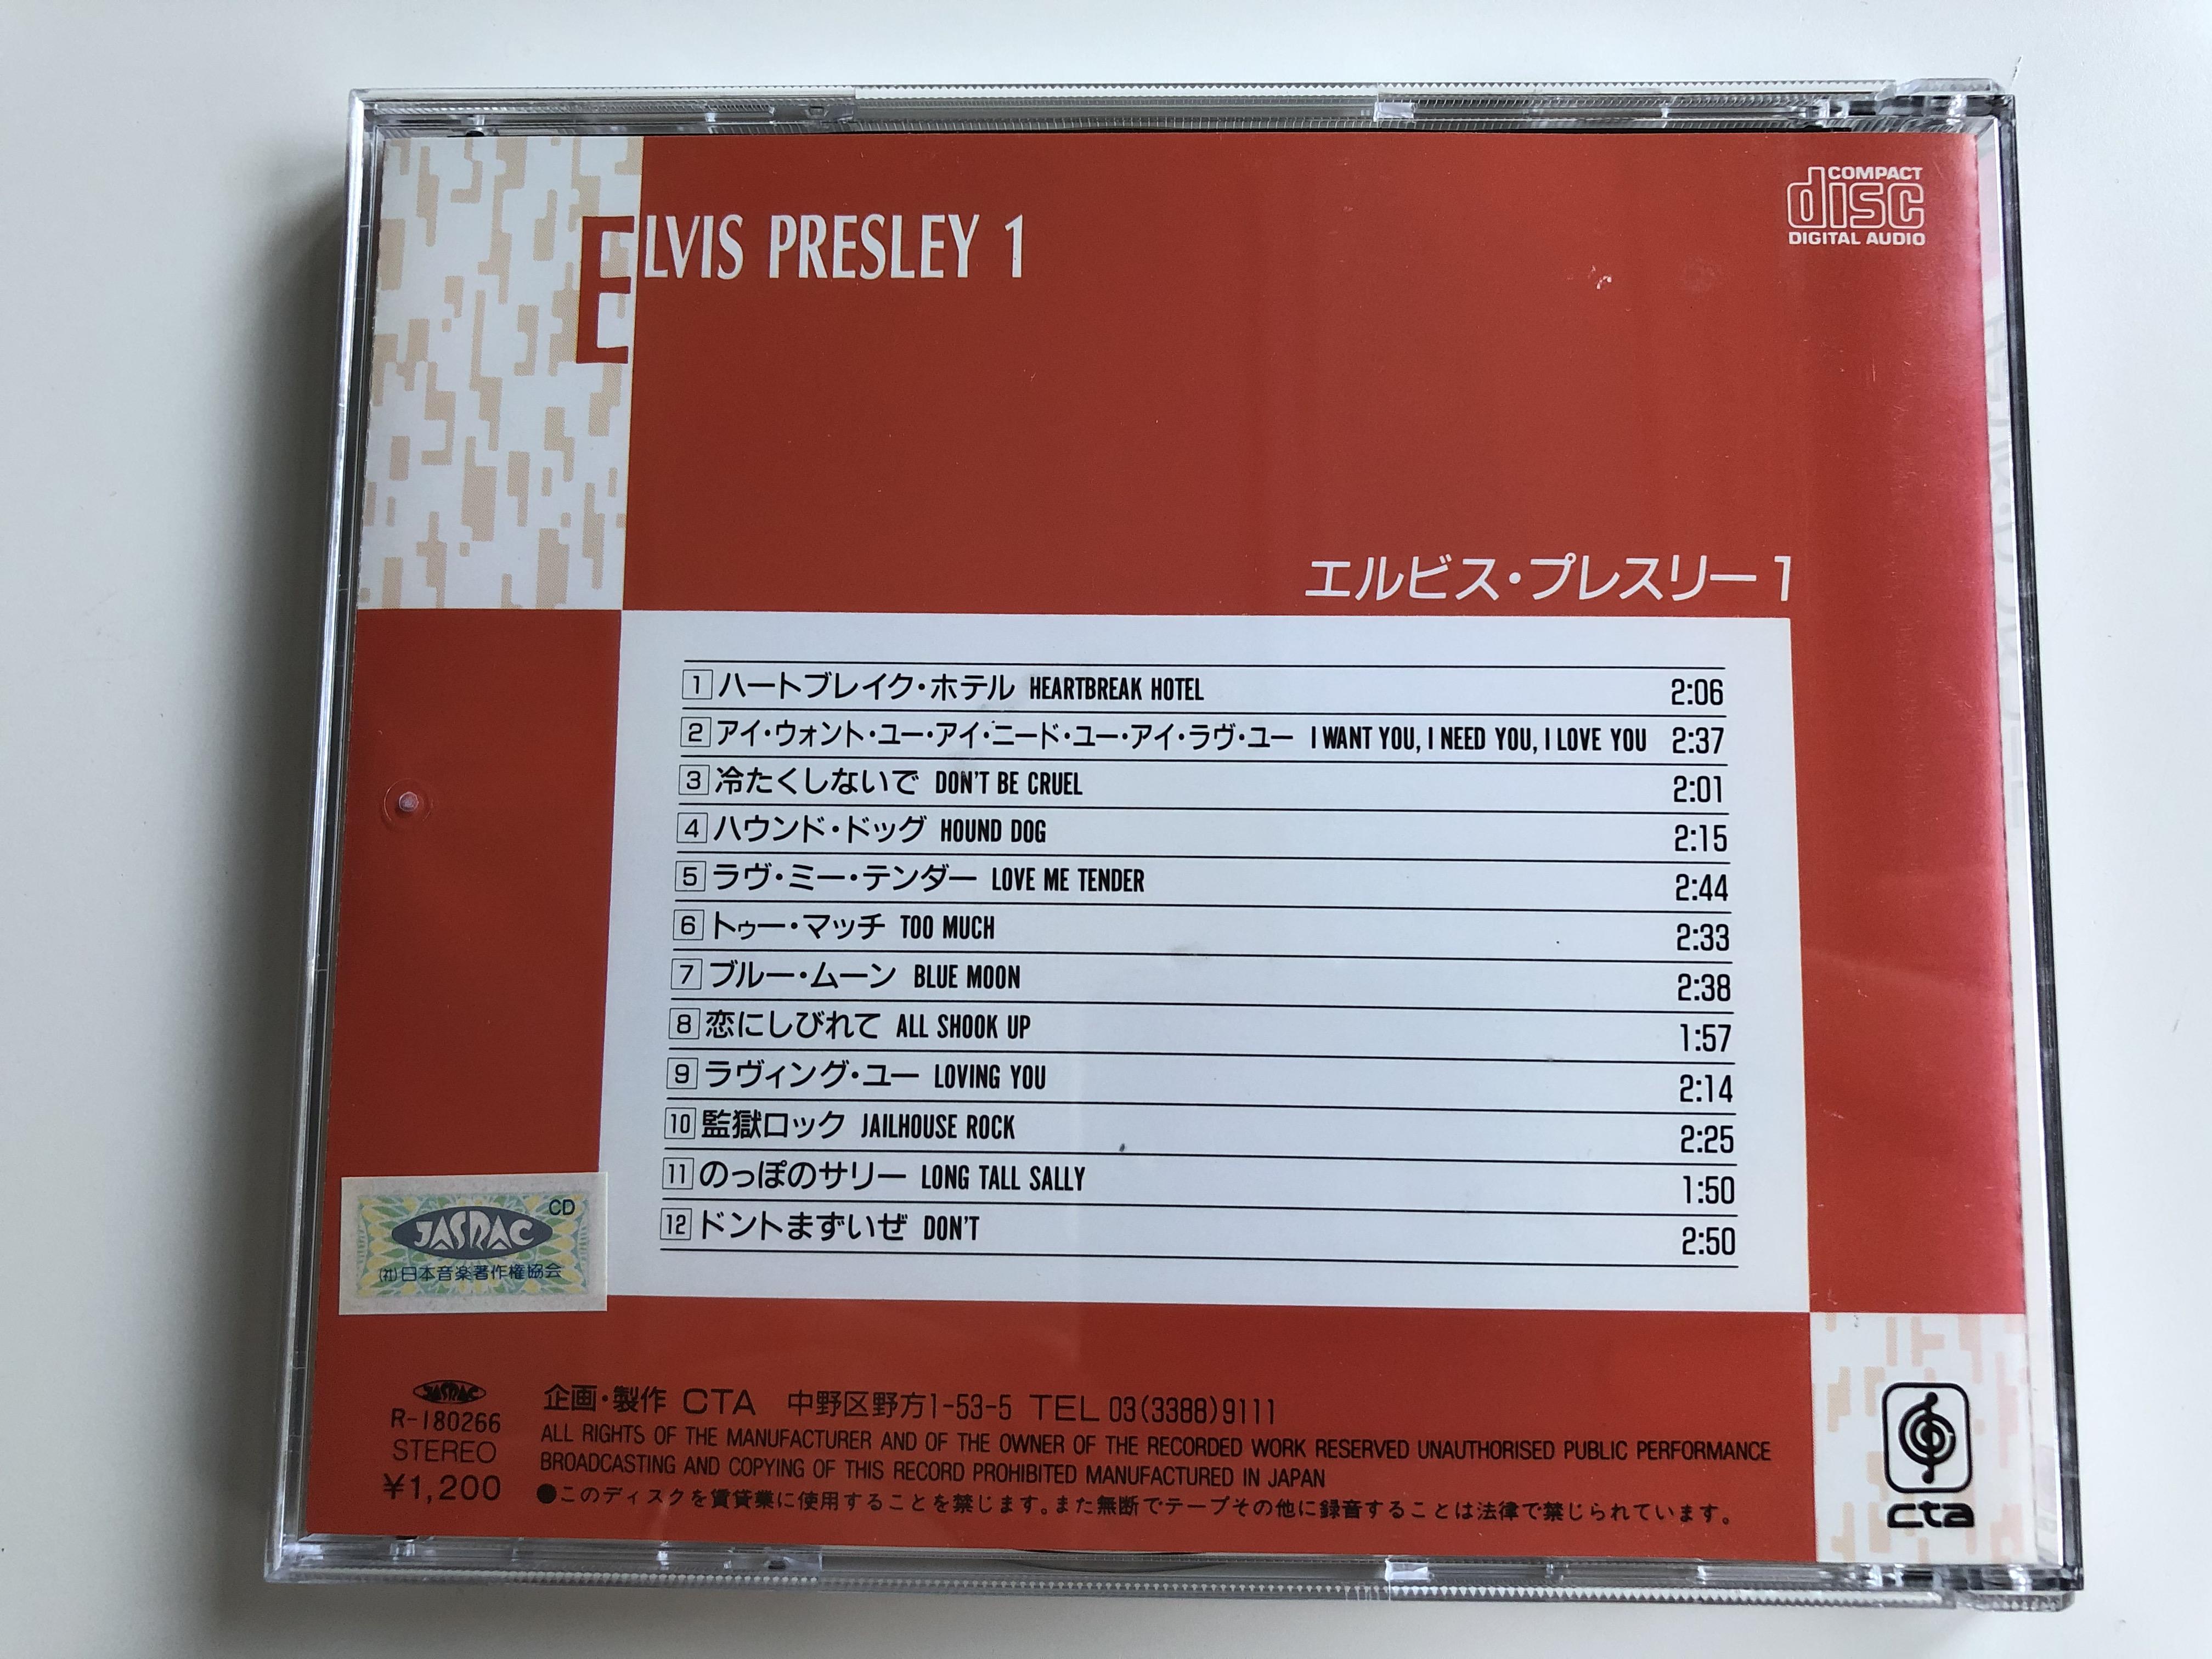 elvis-presley-1-cta-audio-cd-stereo-tf-39-6-.jpg